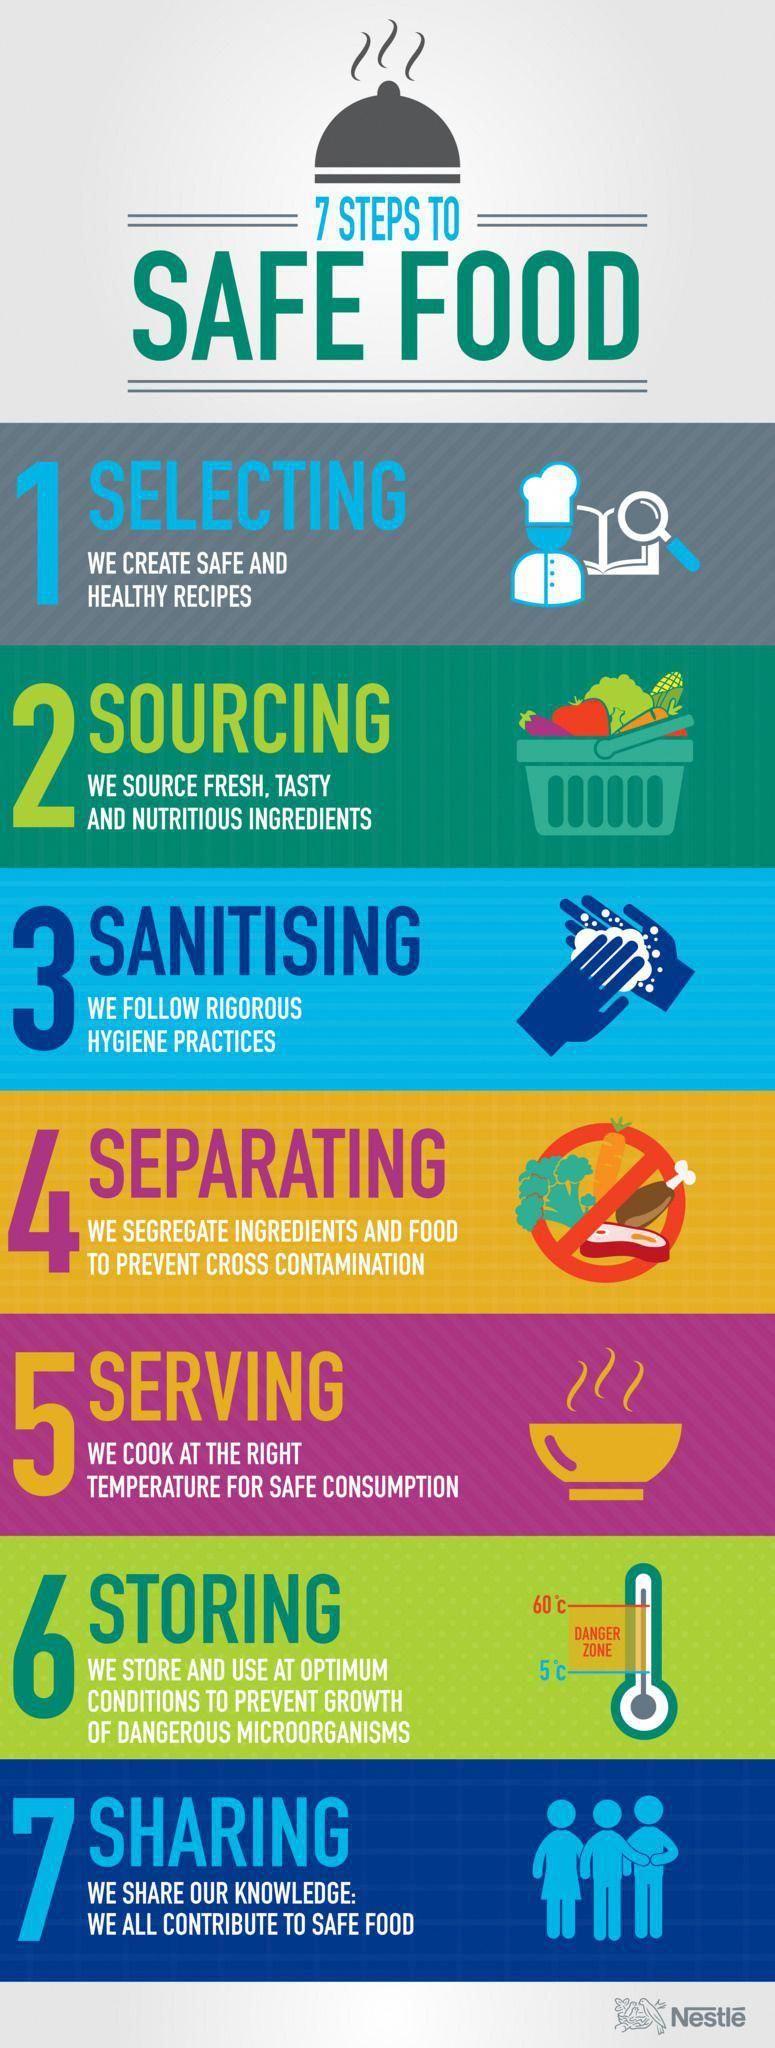 Food hygiene tips foodtipszurich key 4830911272